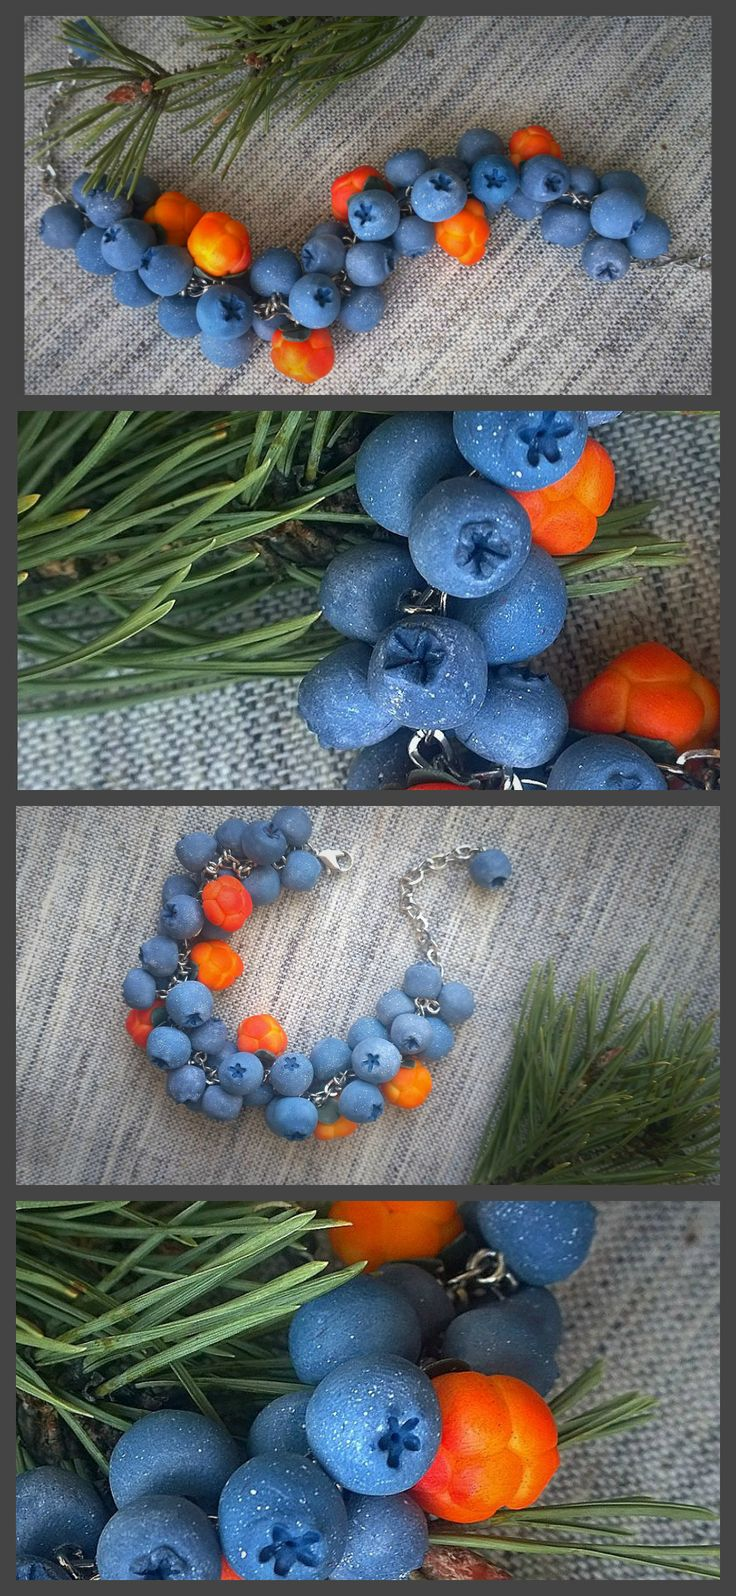 #полимернаяглина #хобби #ручнаяработа #ягоды #зима #черника #морошка #polymerclay #fimo #premo #berries #cloudberry #etsy #blueberry #handmade #wildberries #food #summer #sculpey #silverushka